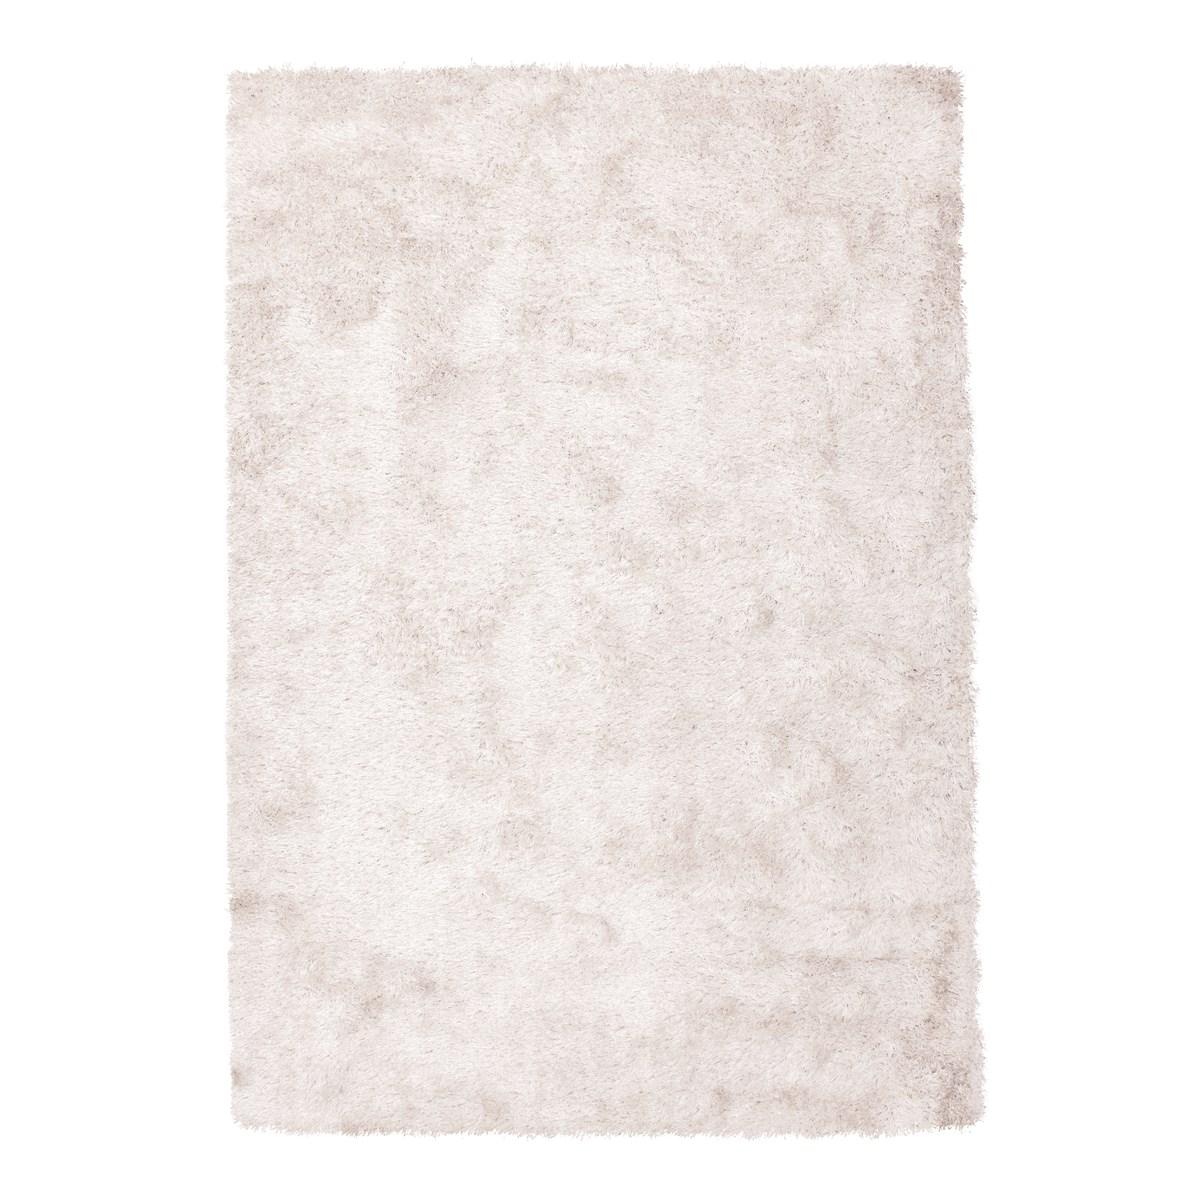 Tapis shaggy en Polyester Blanc cassé 120x170 cm